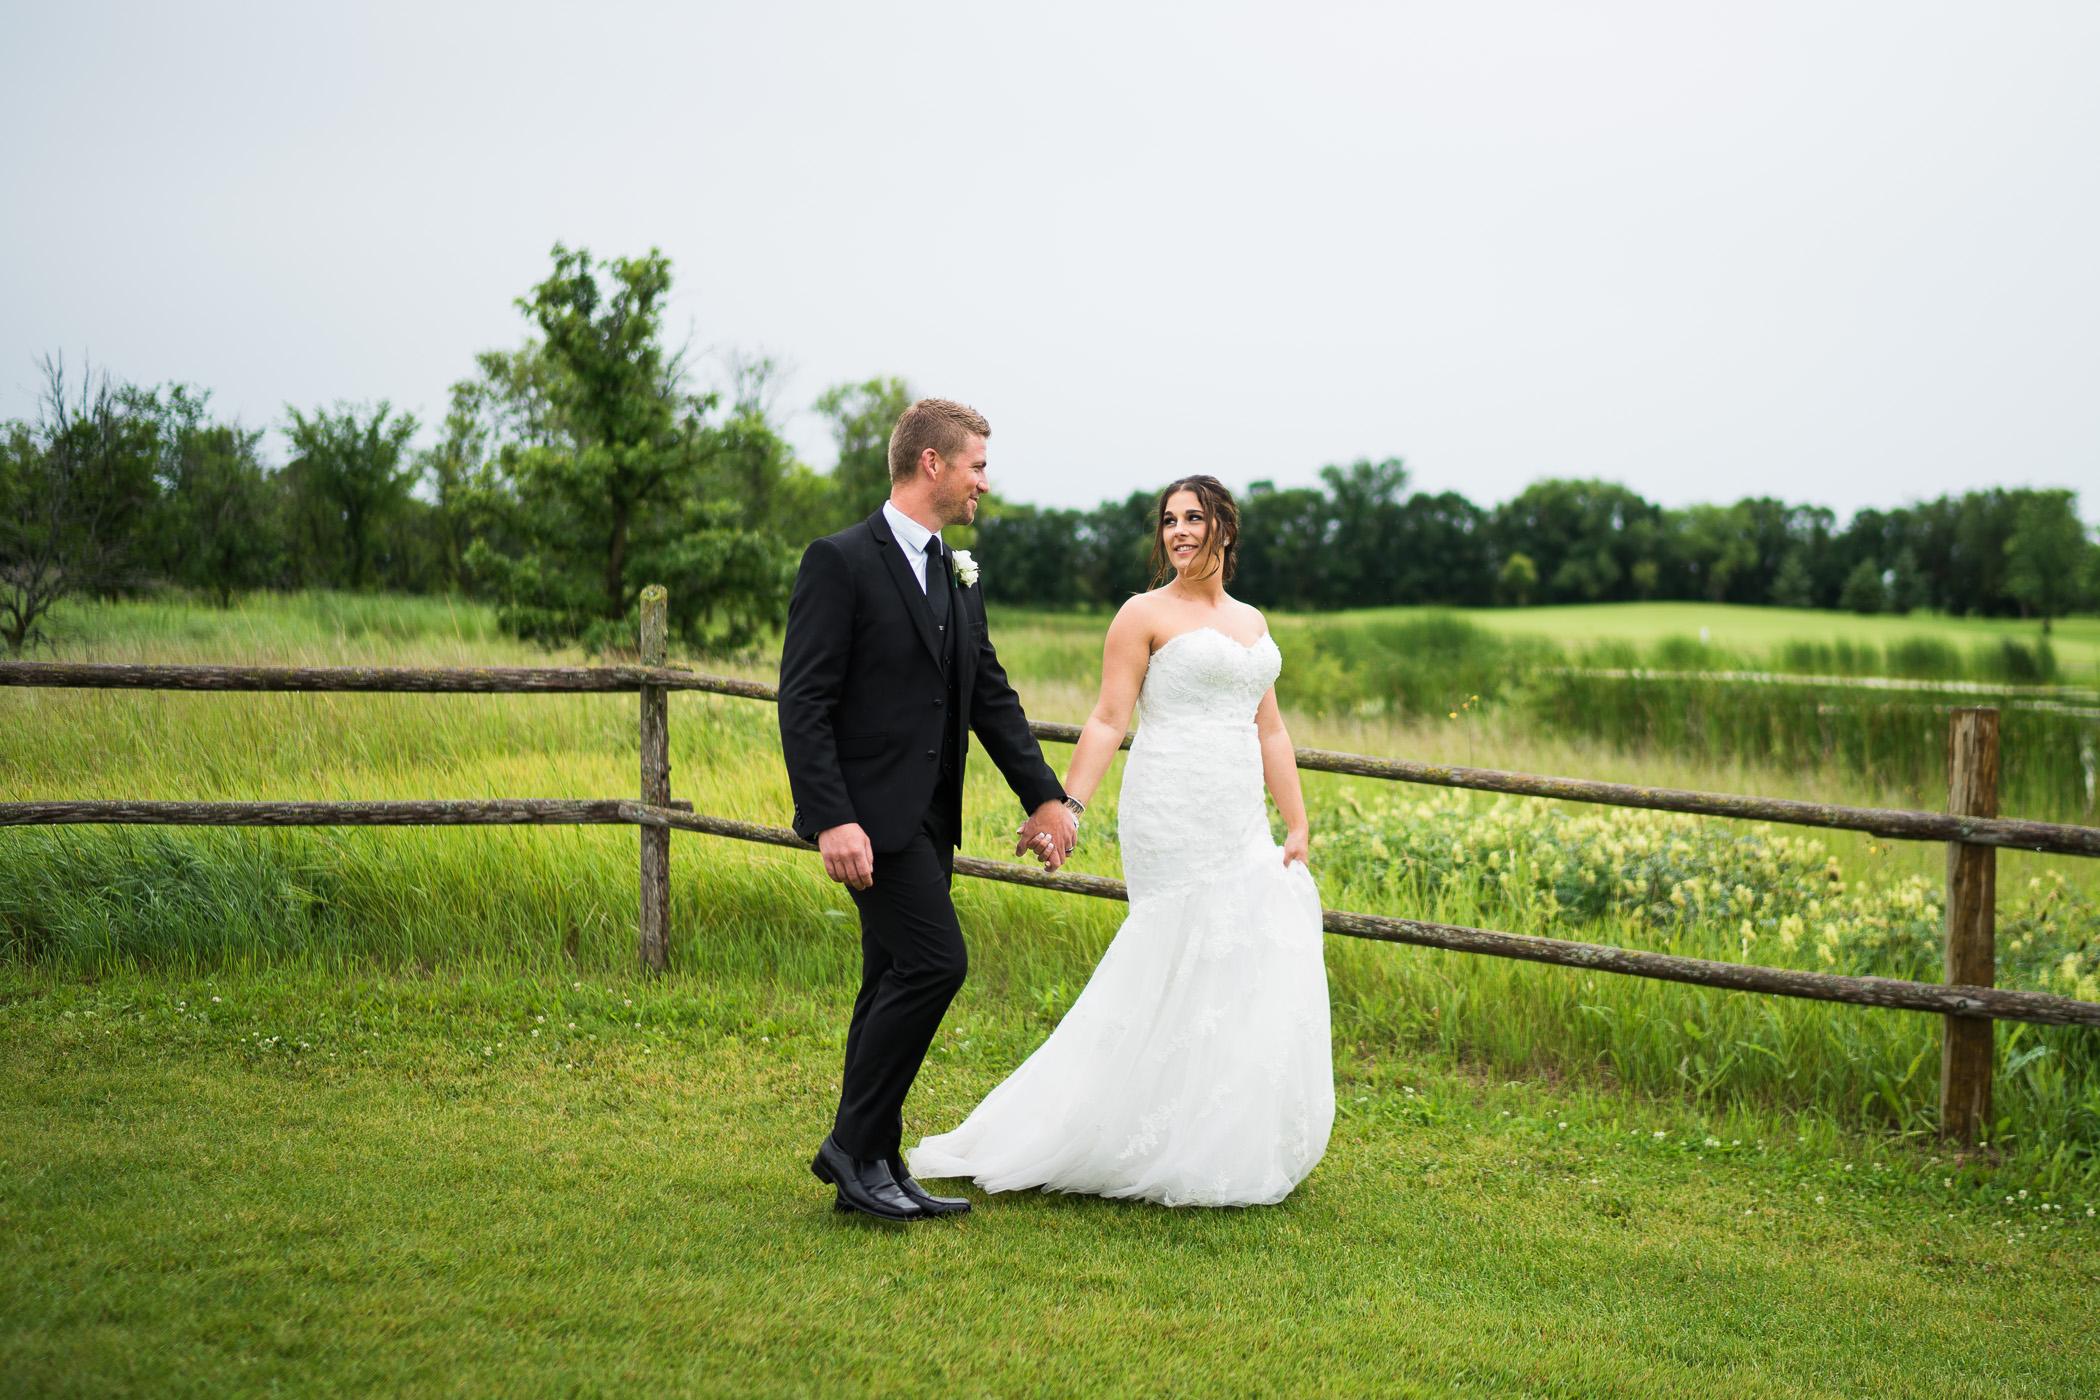 Marie and Steve - Breezy Bend Wedding - Cojo Photo-1431.jpg